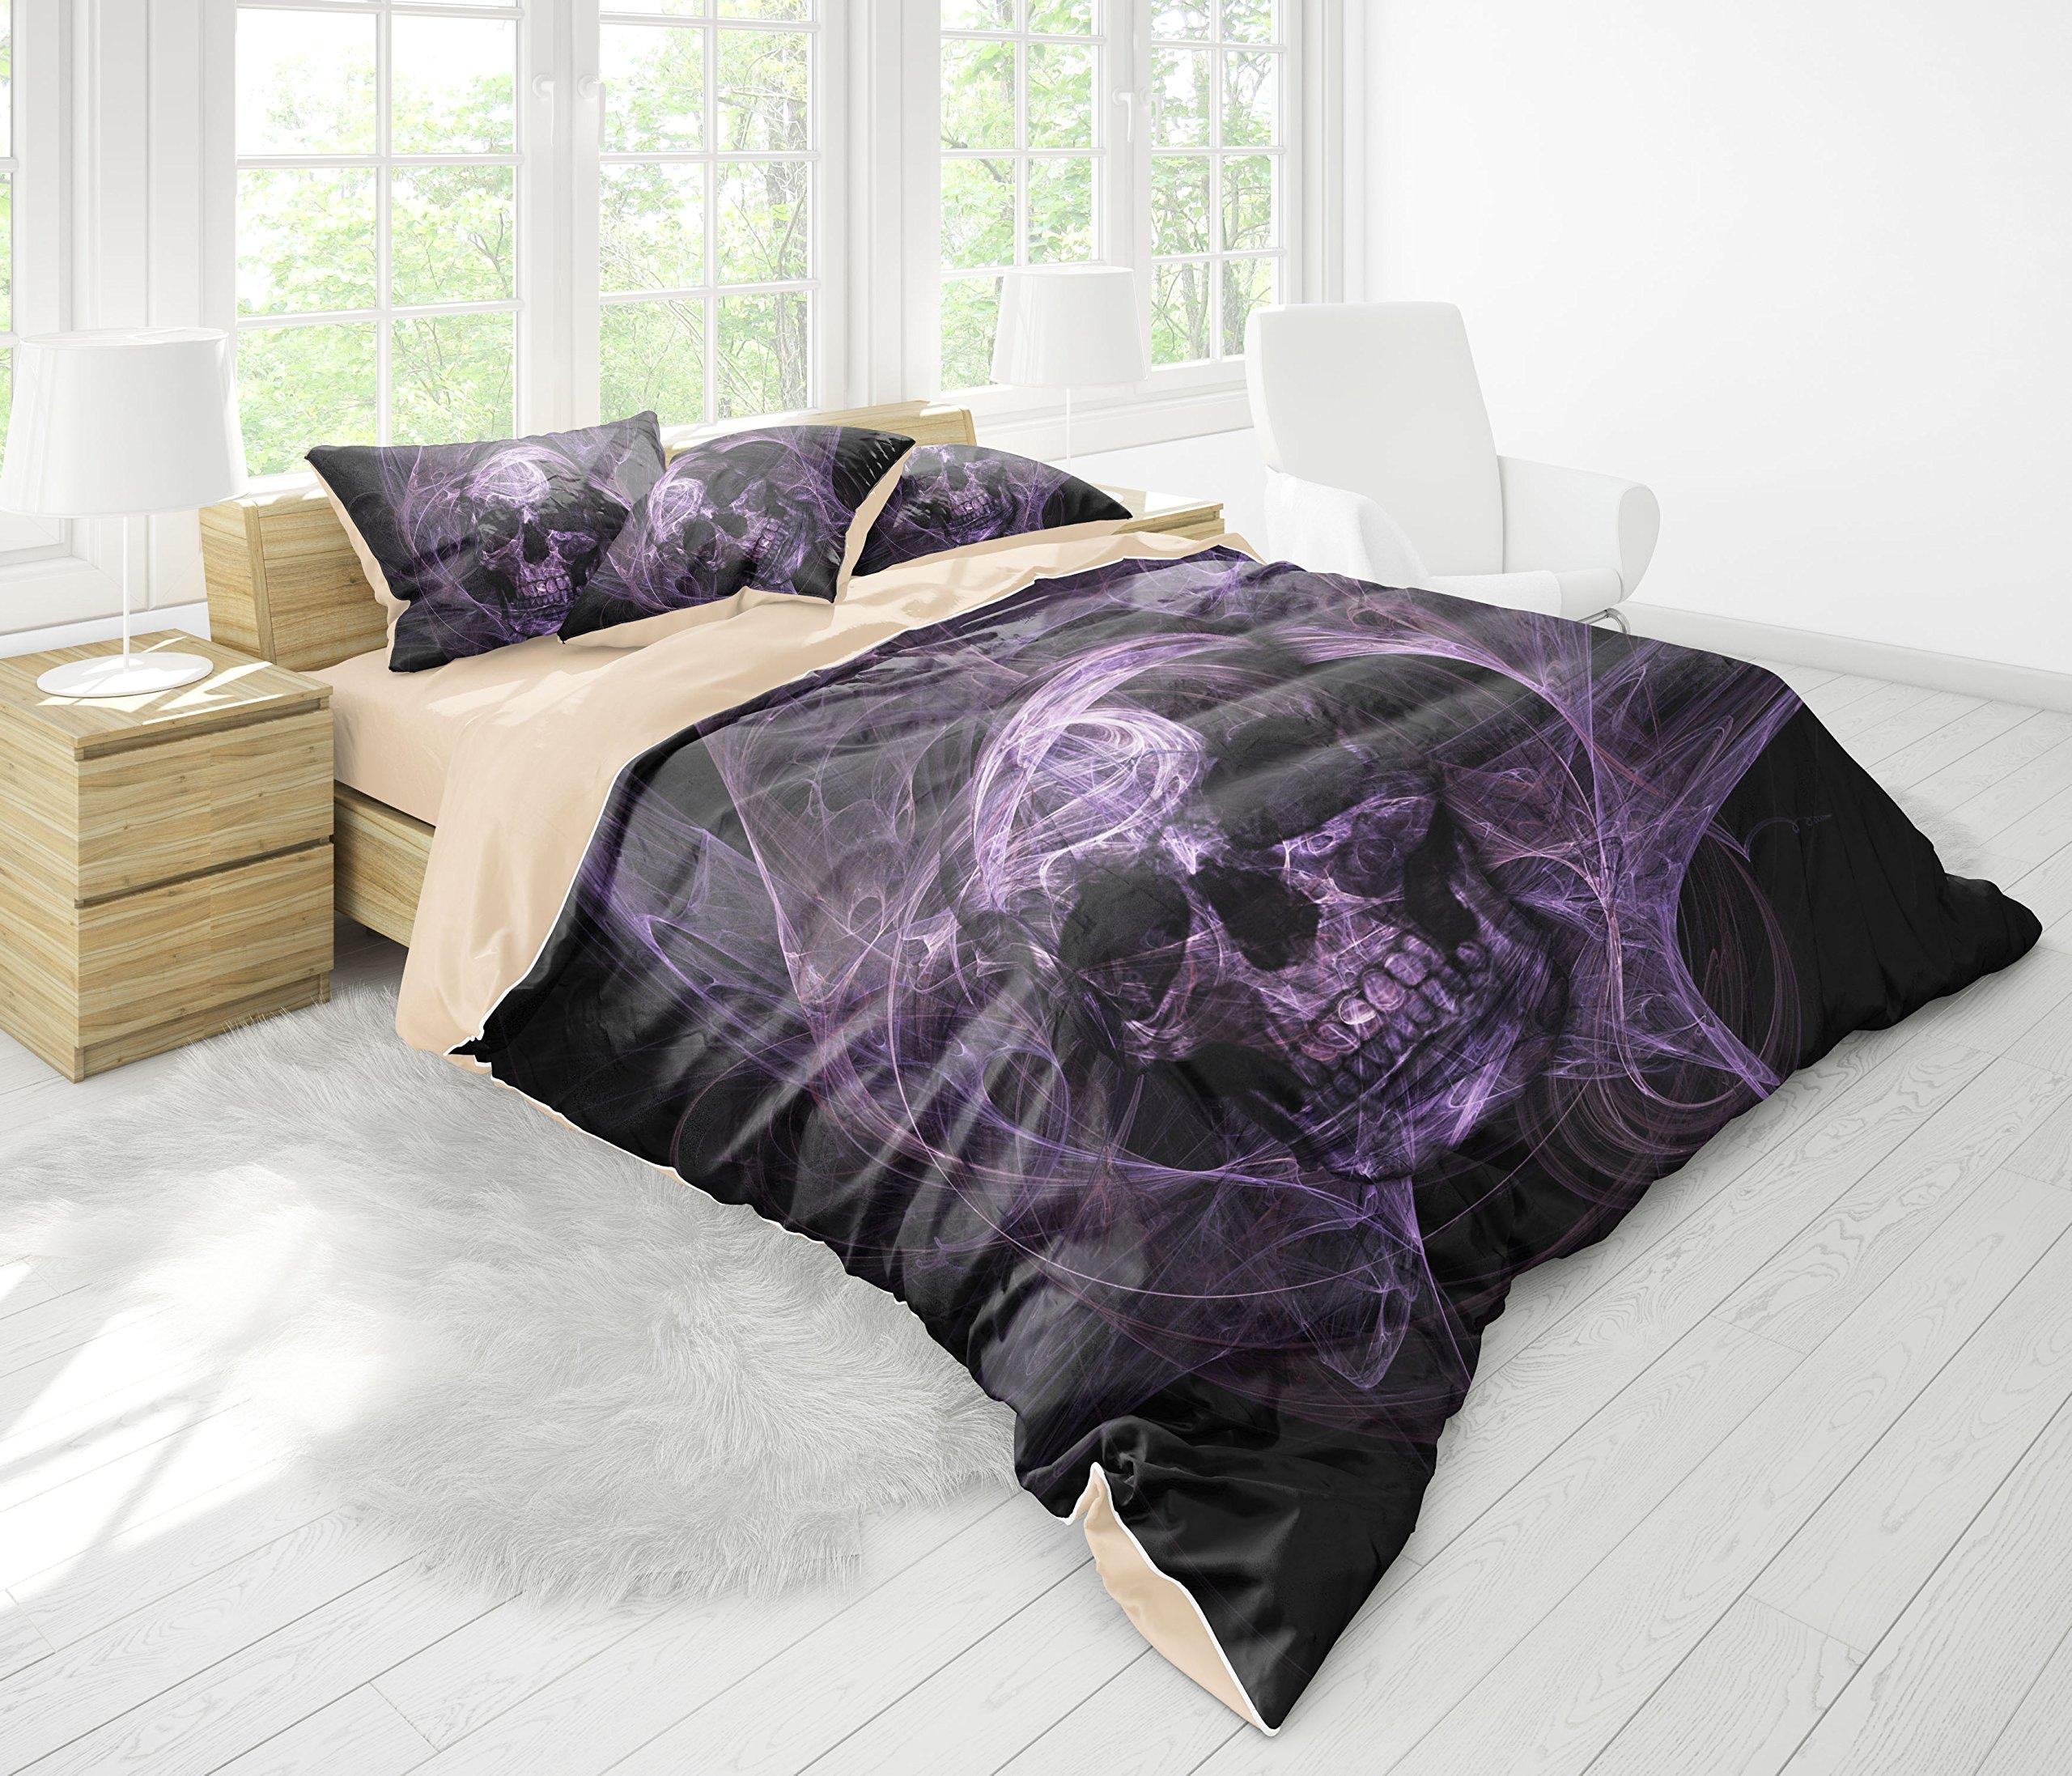 FAITOVE Black Skull Microfiber 3pc 90''x90'' Bedding Quilt Duvet Cover Sets 2 Pillow Cases Queen Size